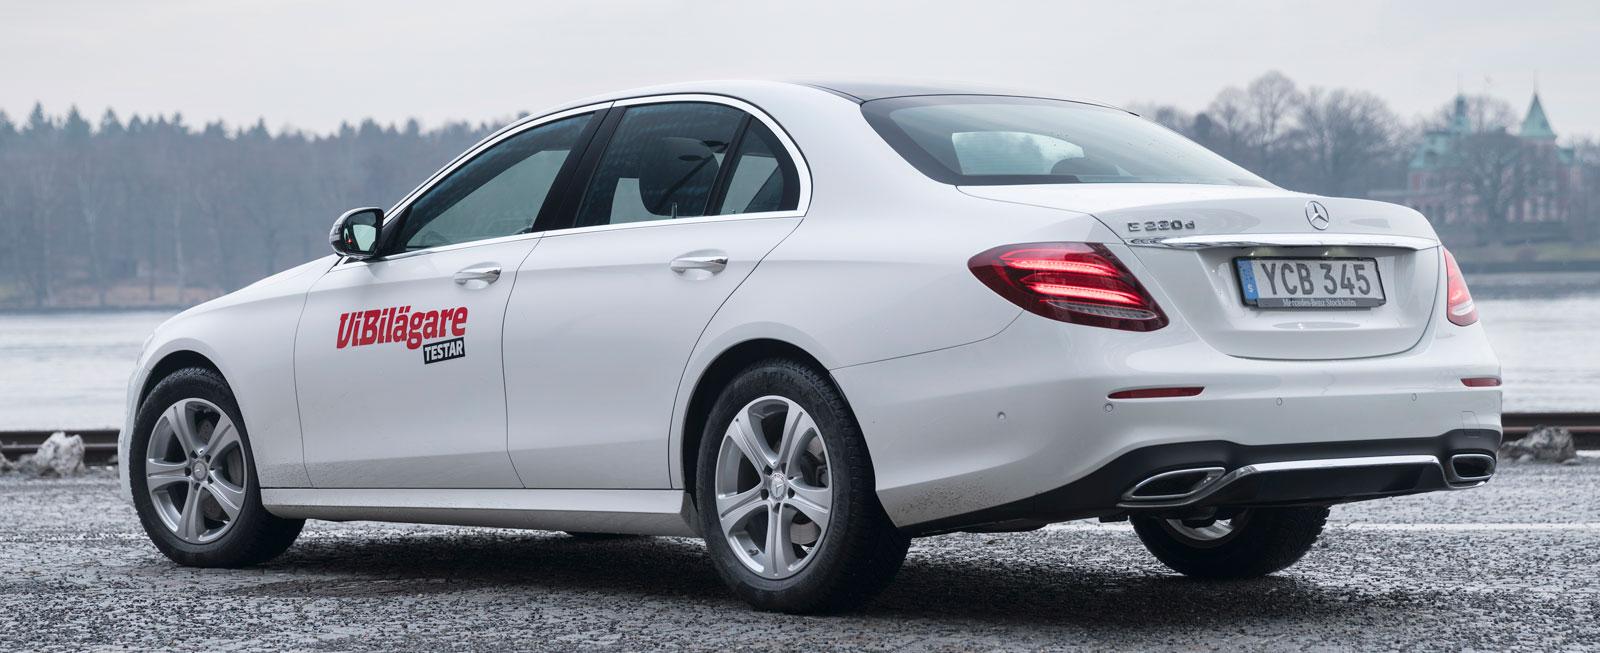 Mercedes-Benz 220d Se Edition